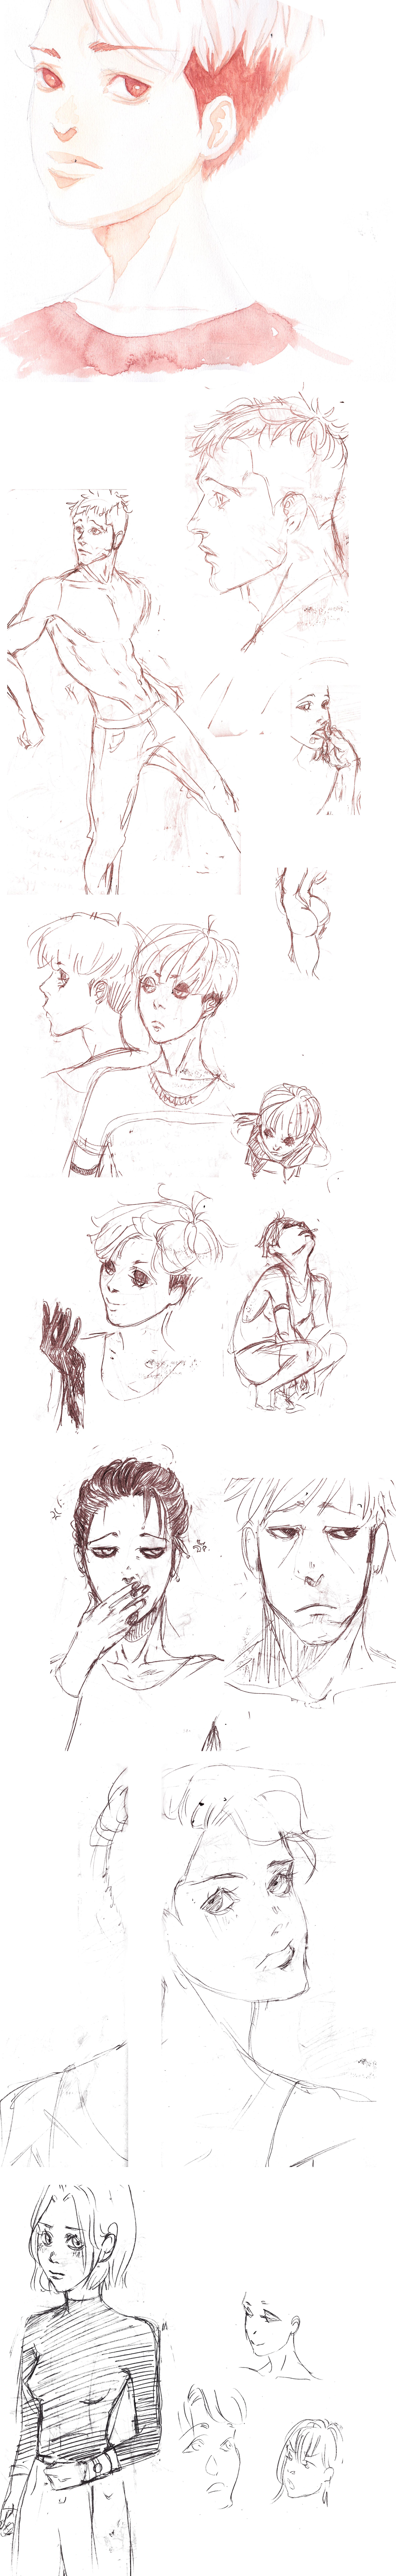 Je ne te fais pas un dessin. Sketch_3__by_mushroomattic-dcalyi9